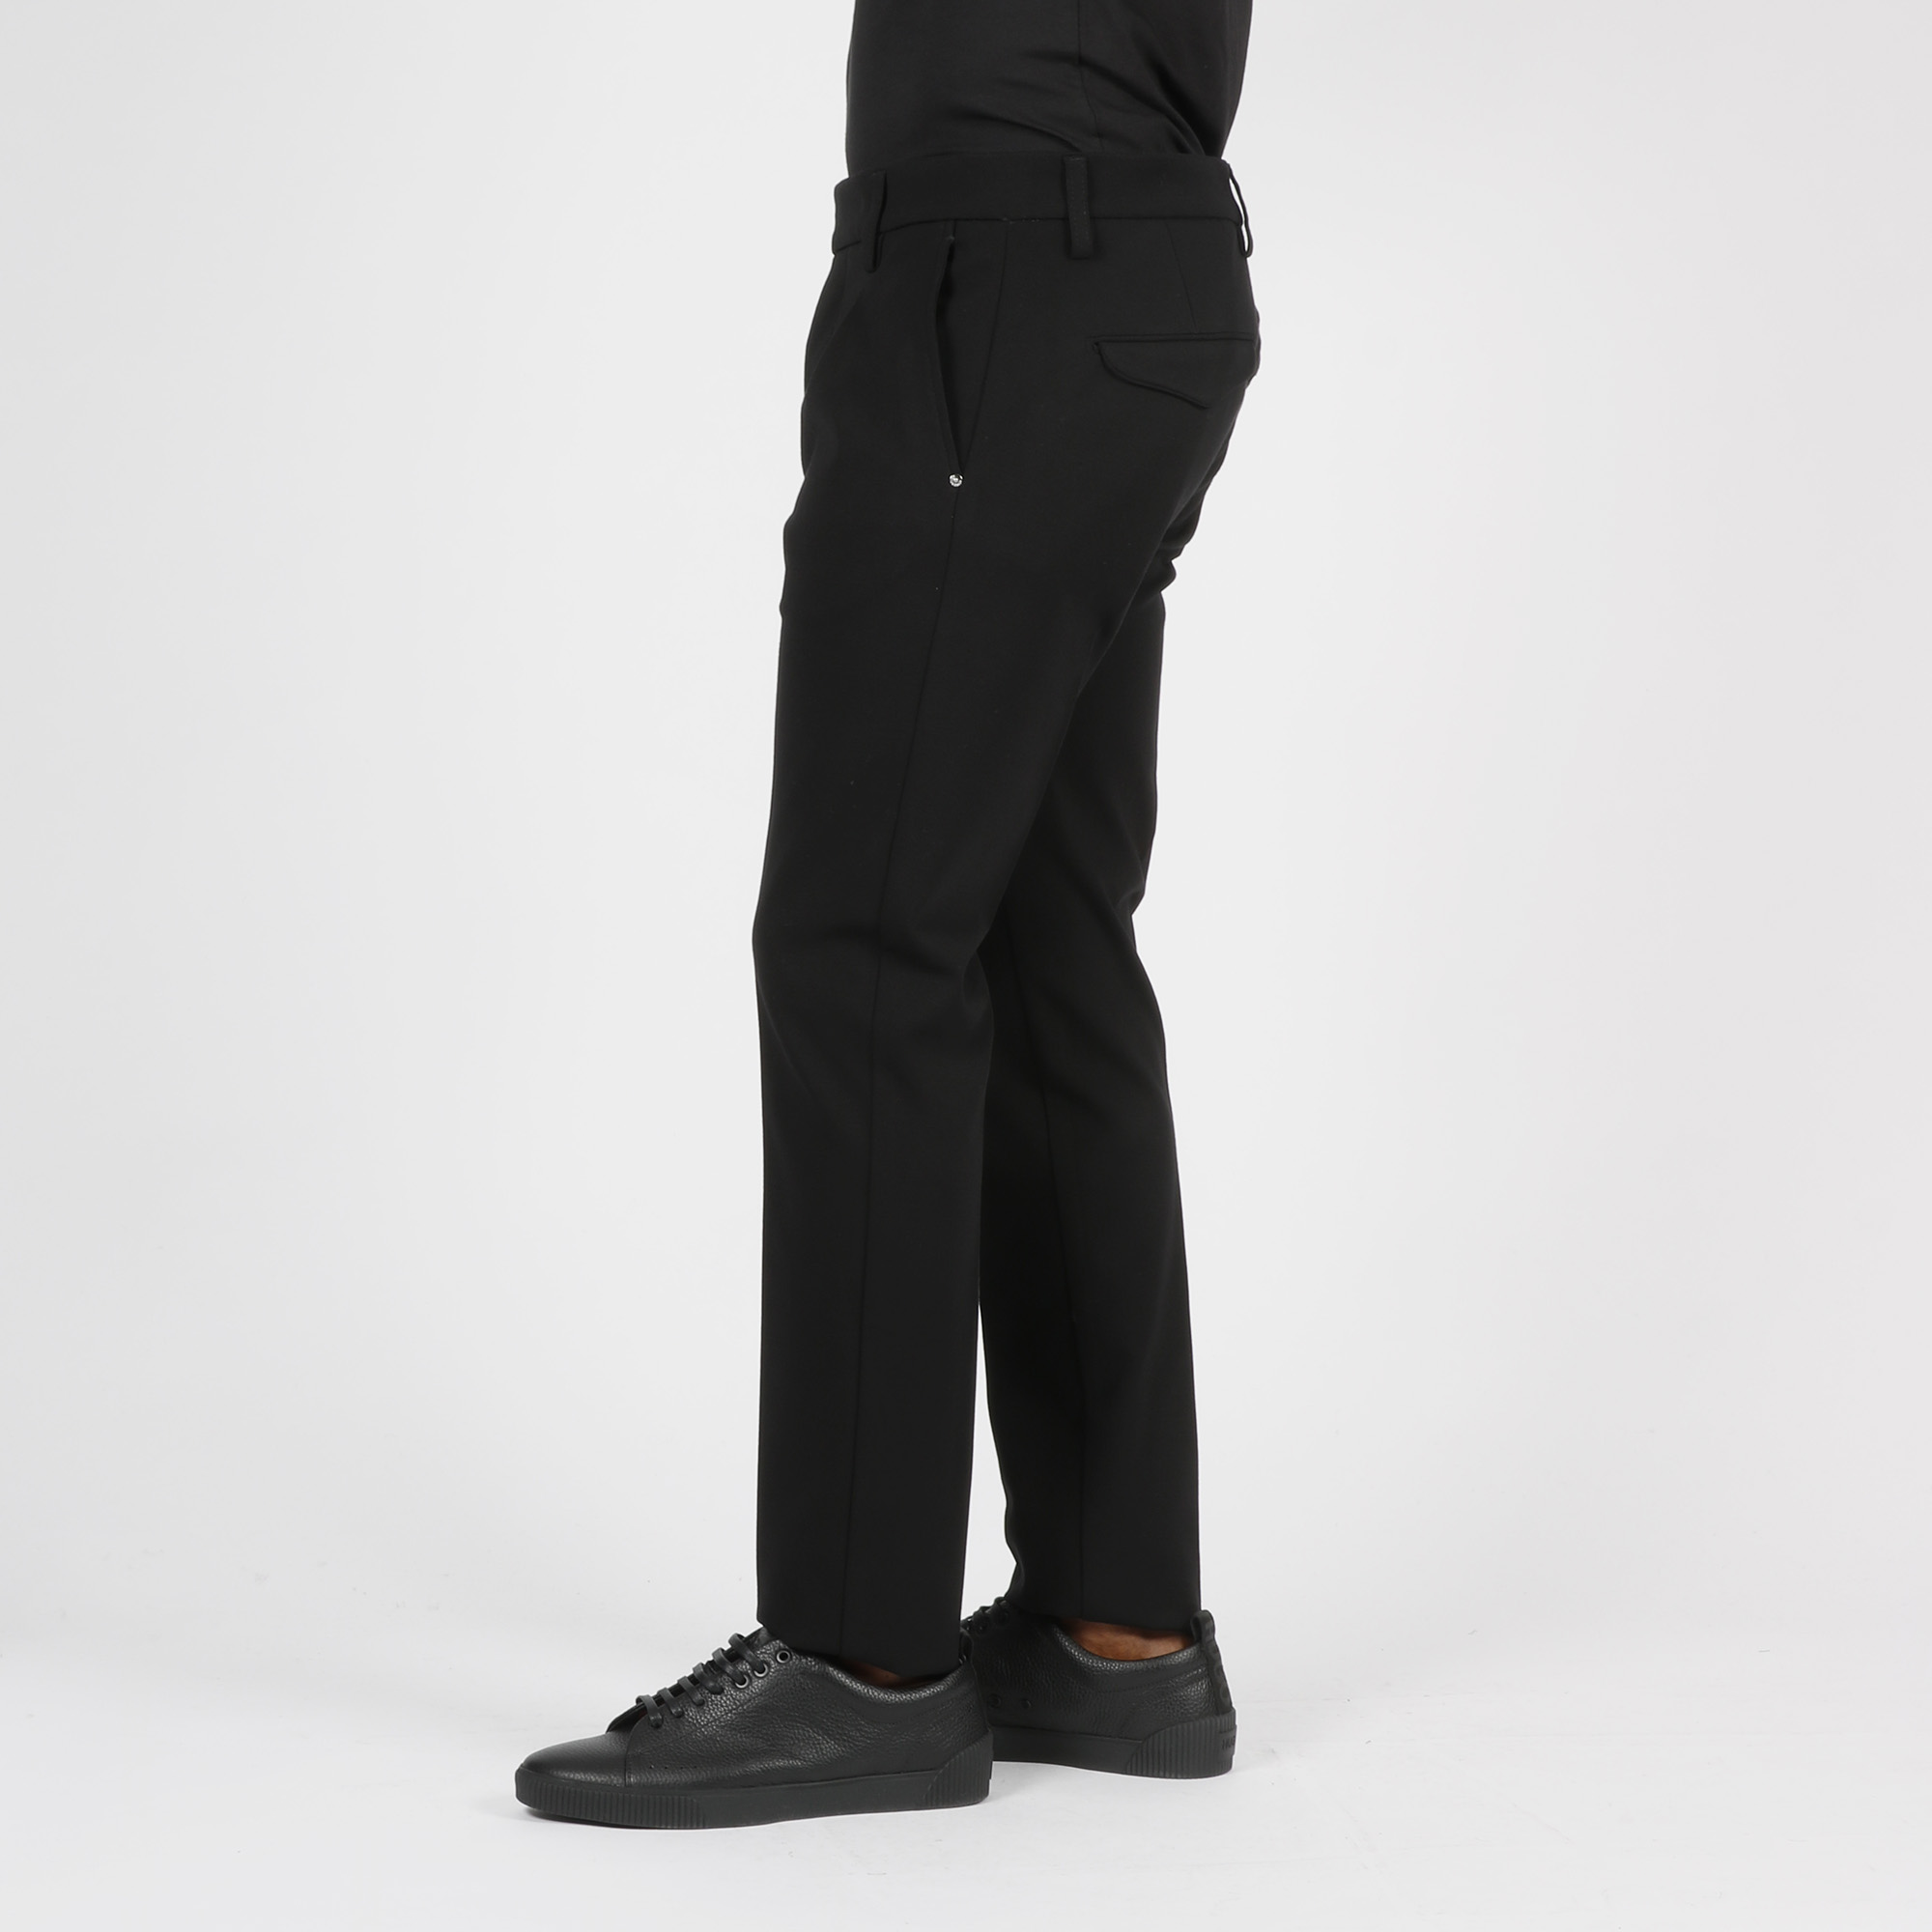 Pantalone malafemmina - Nero